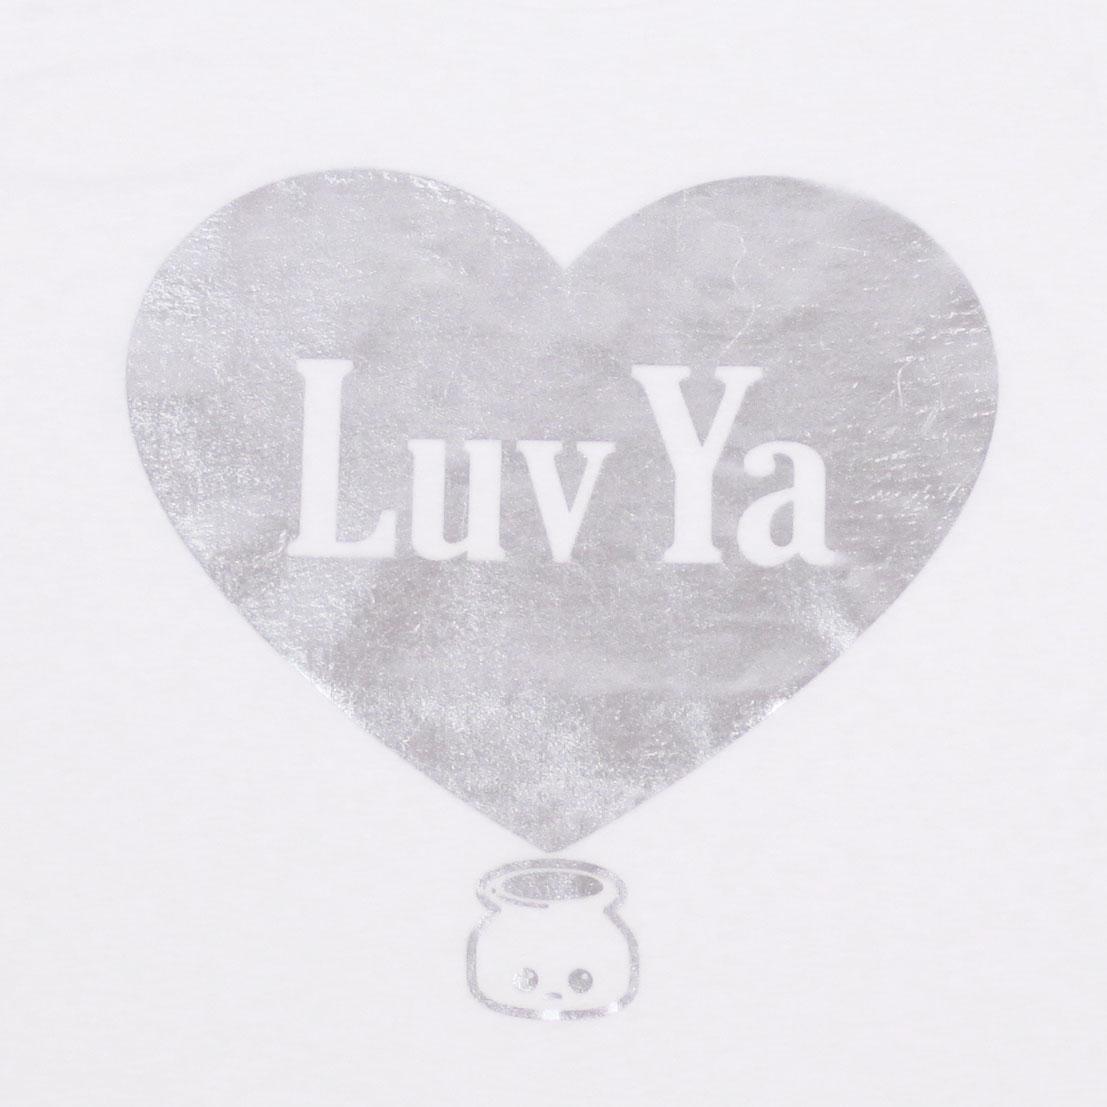 Luv Ya (White)